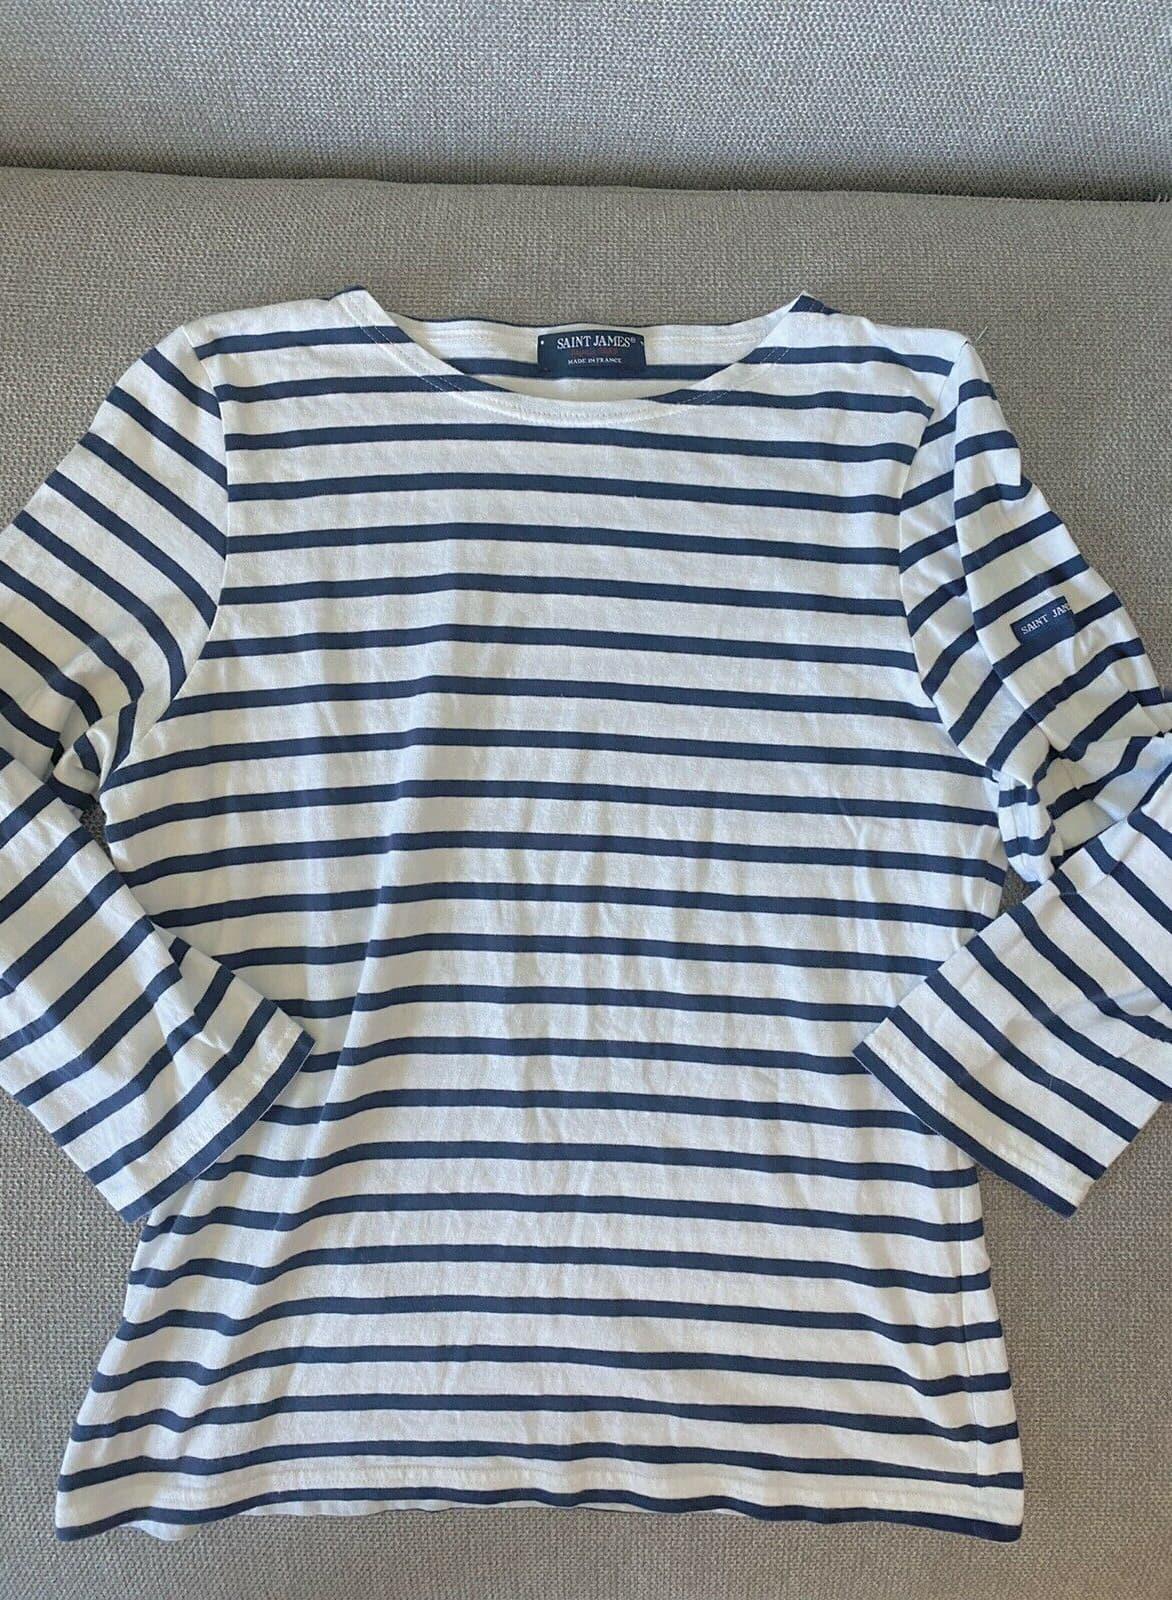 saint james stripe shirt top xs